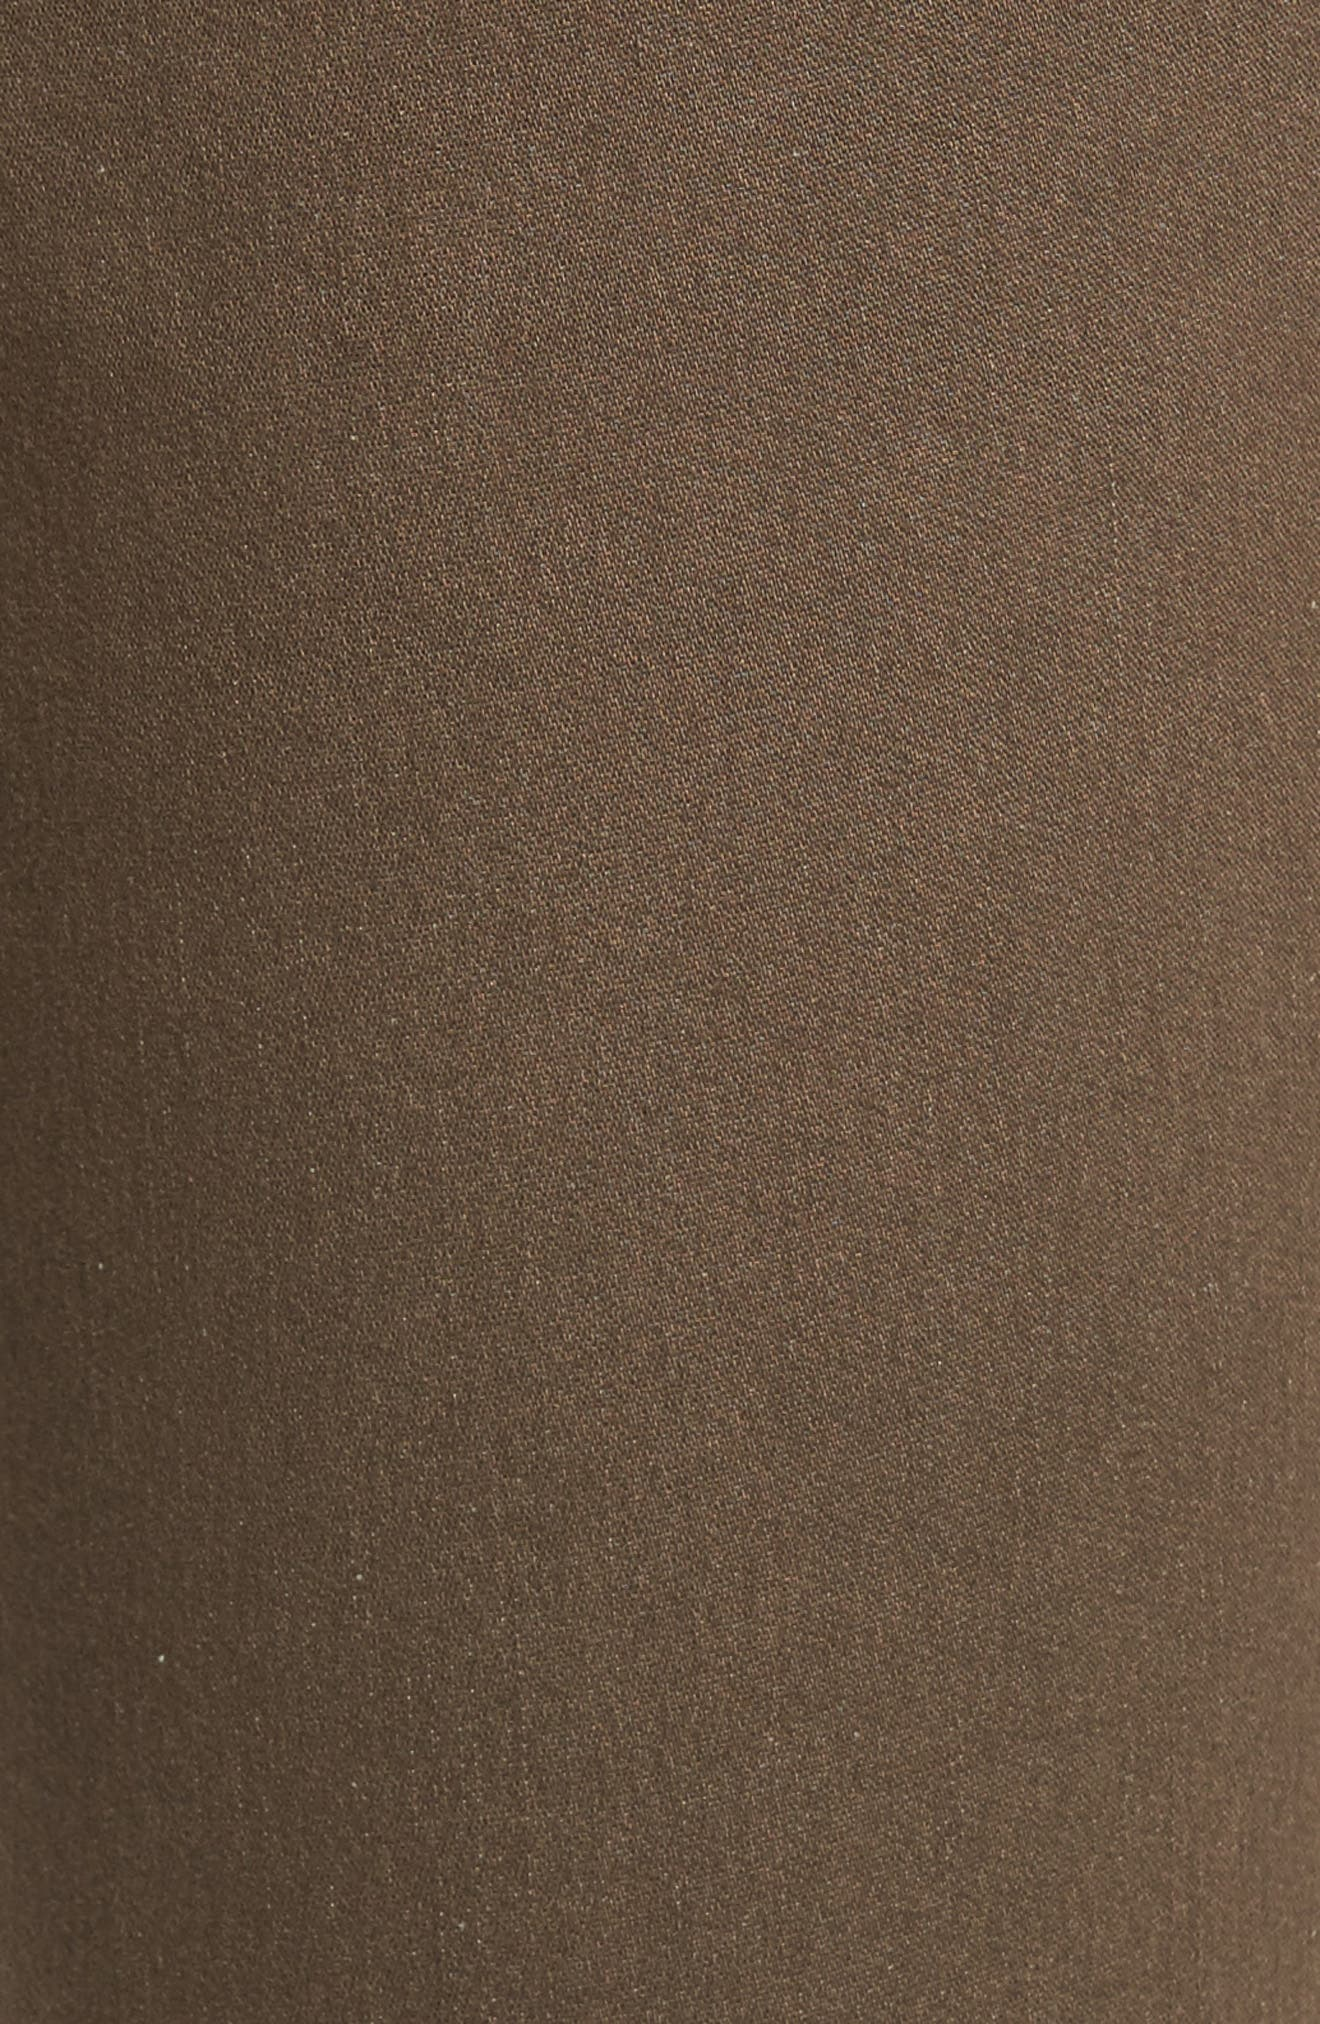 Ryan Knit Skinny Jeans,                             Alternate thumbnail 5, color,                             Saddle